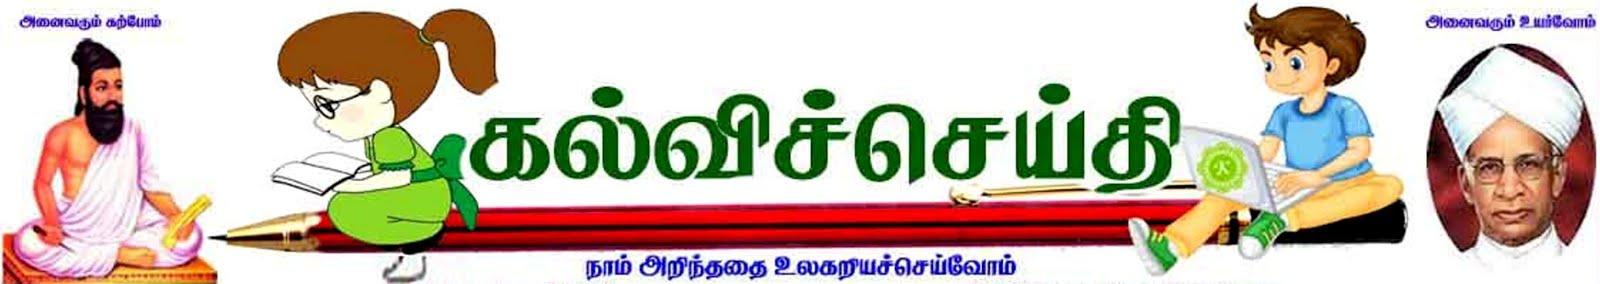 TN VELAI.in / kalviseithi